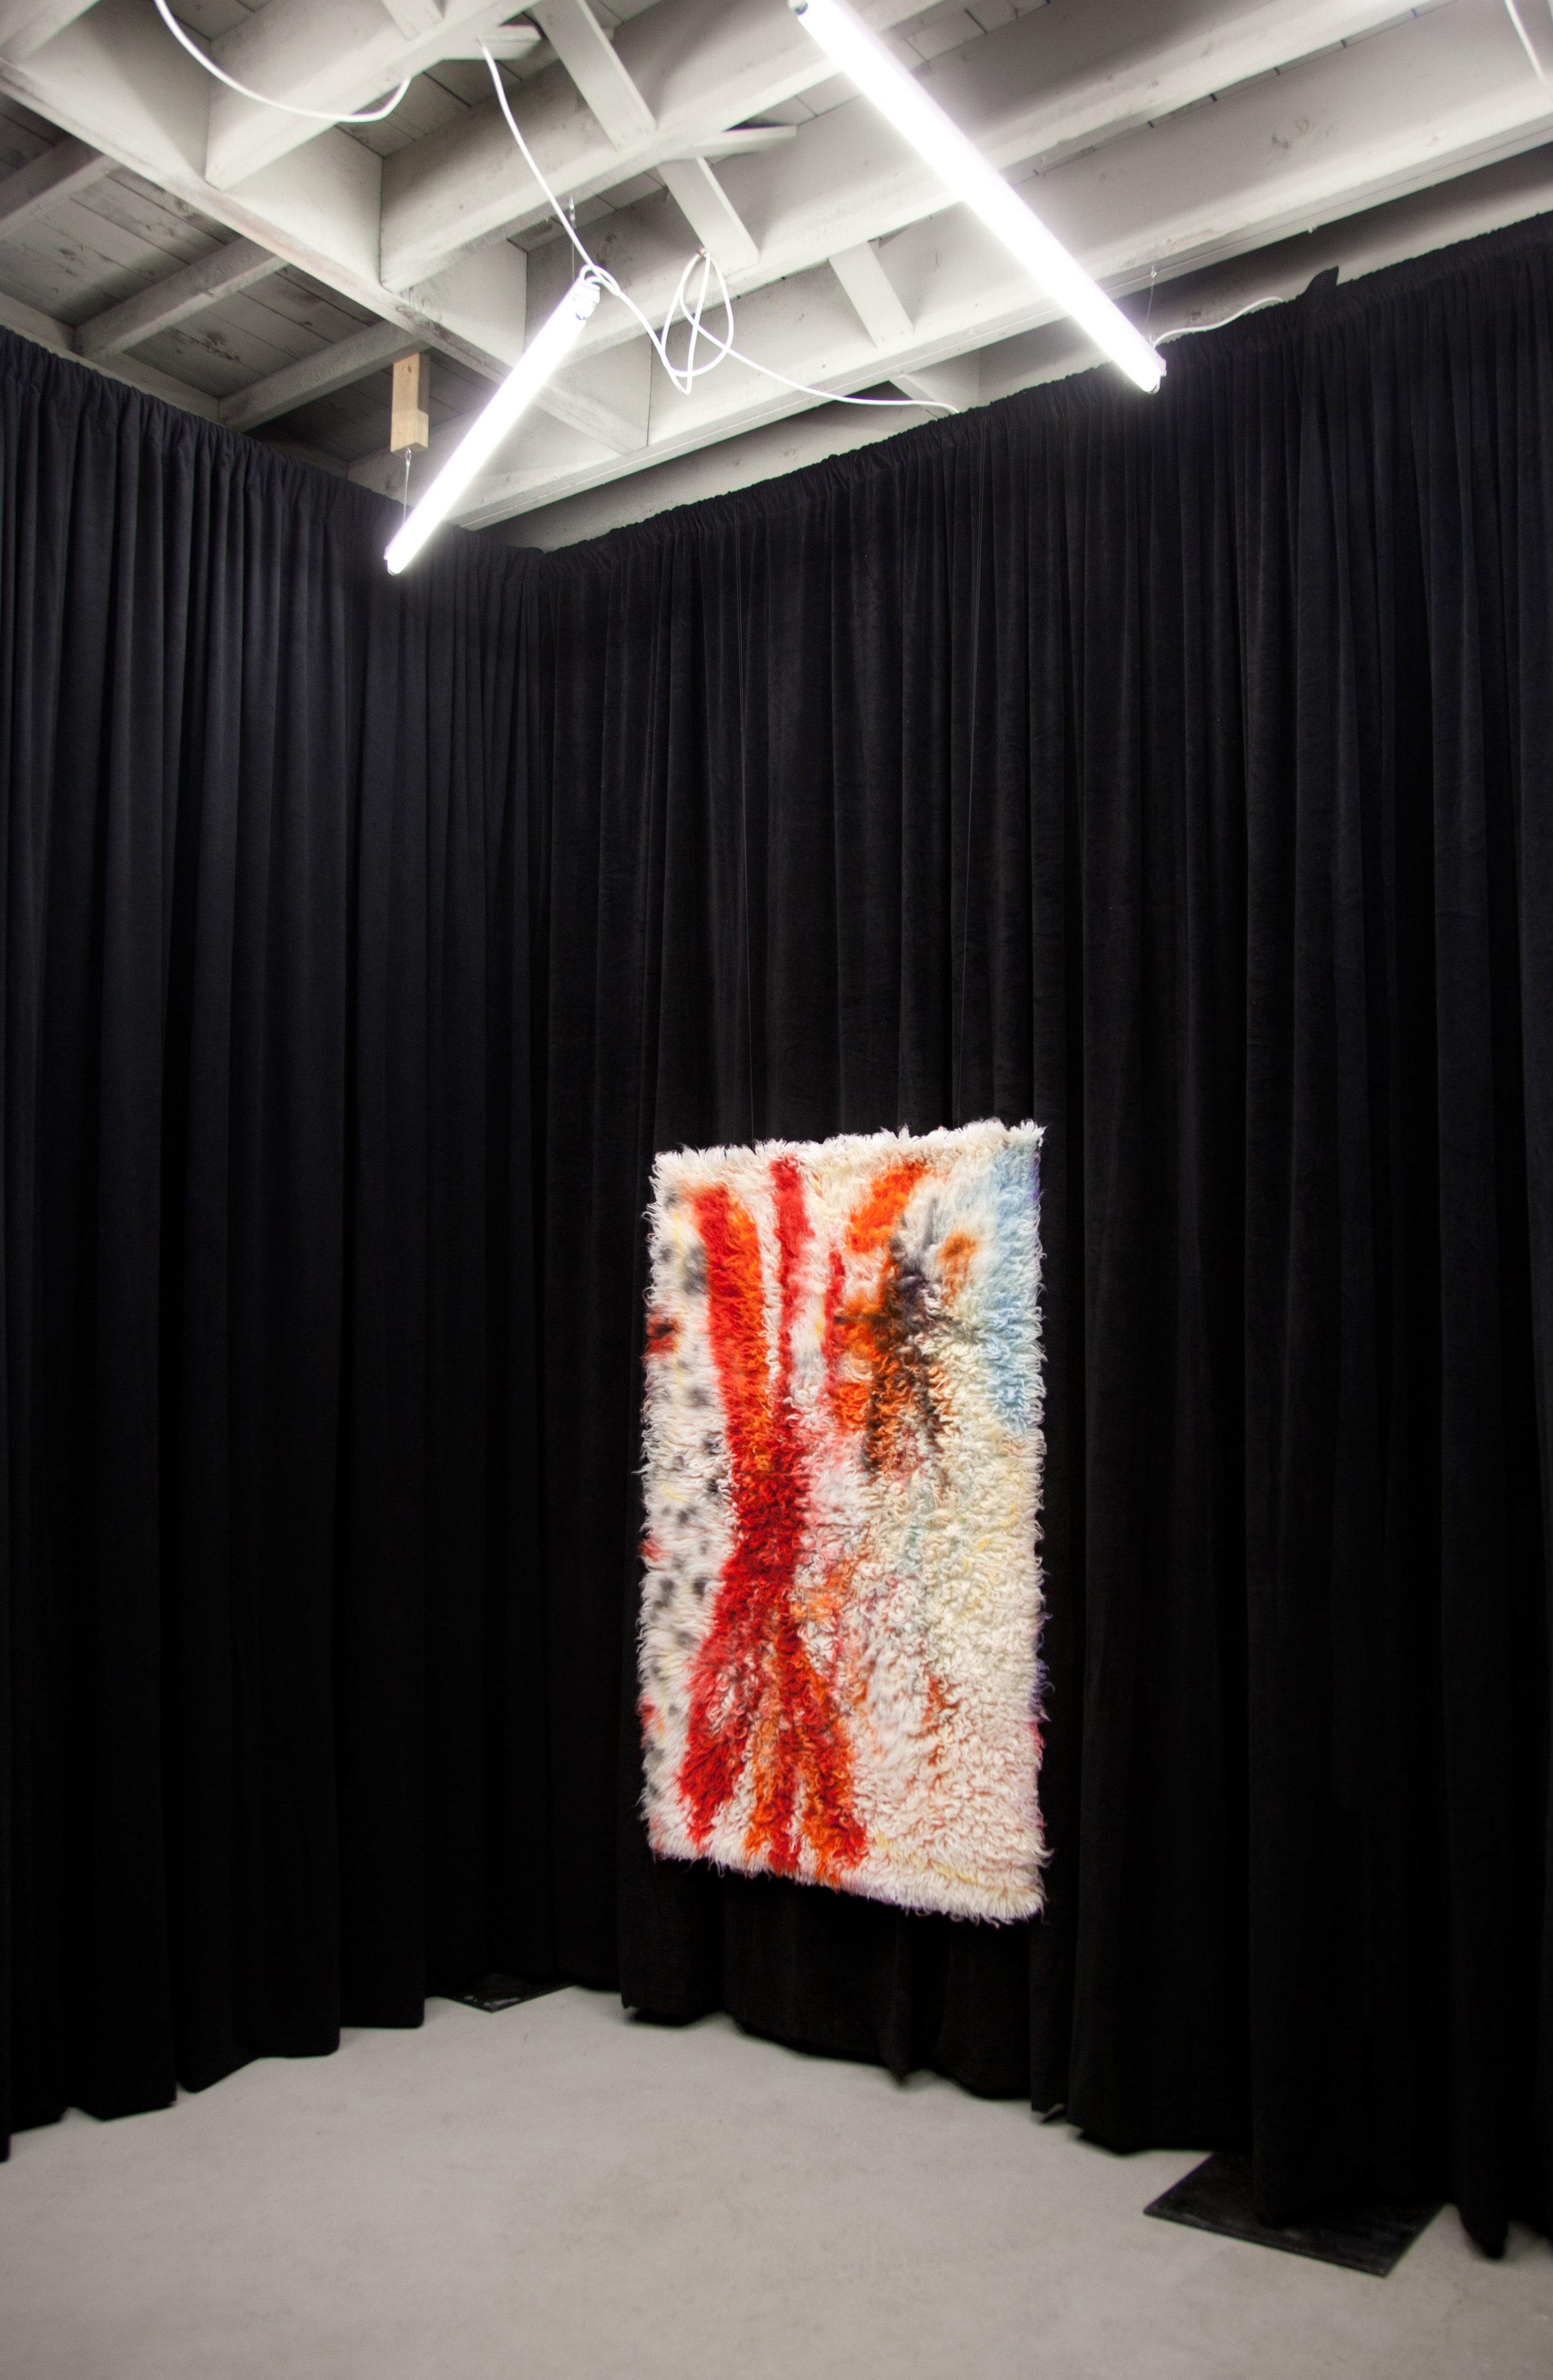 Sticks and Stones, 2017,  wool rug, acid dye, hairspray, chalk.4'x6'